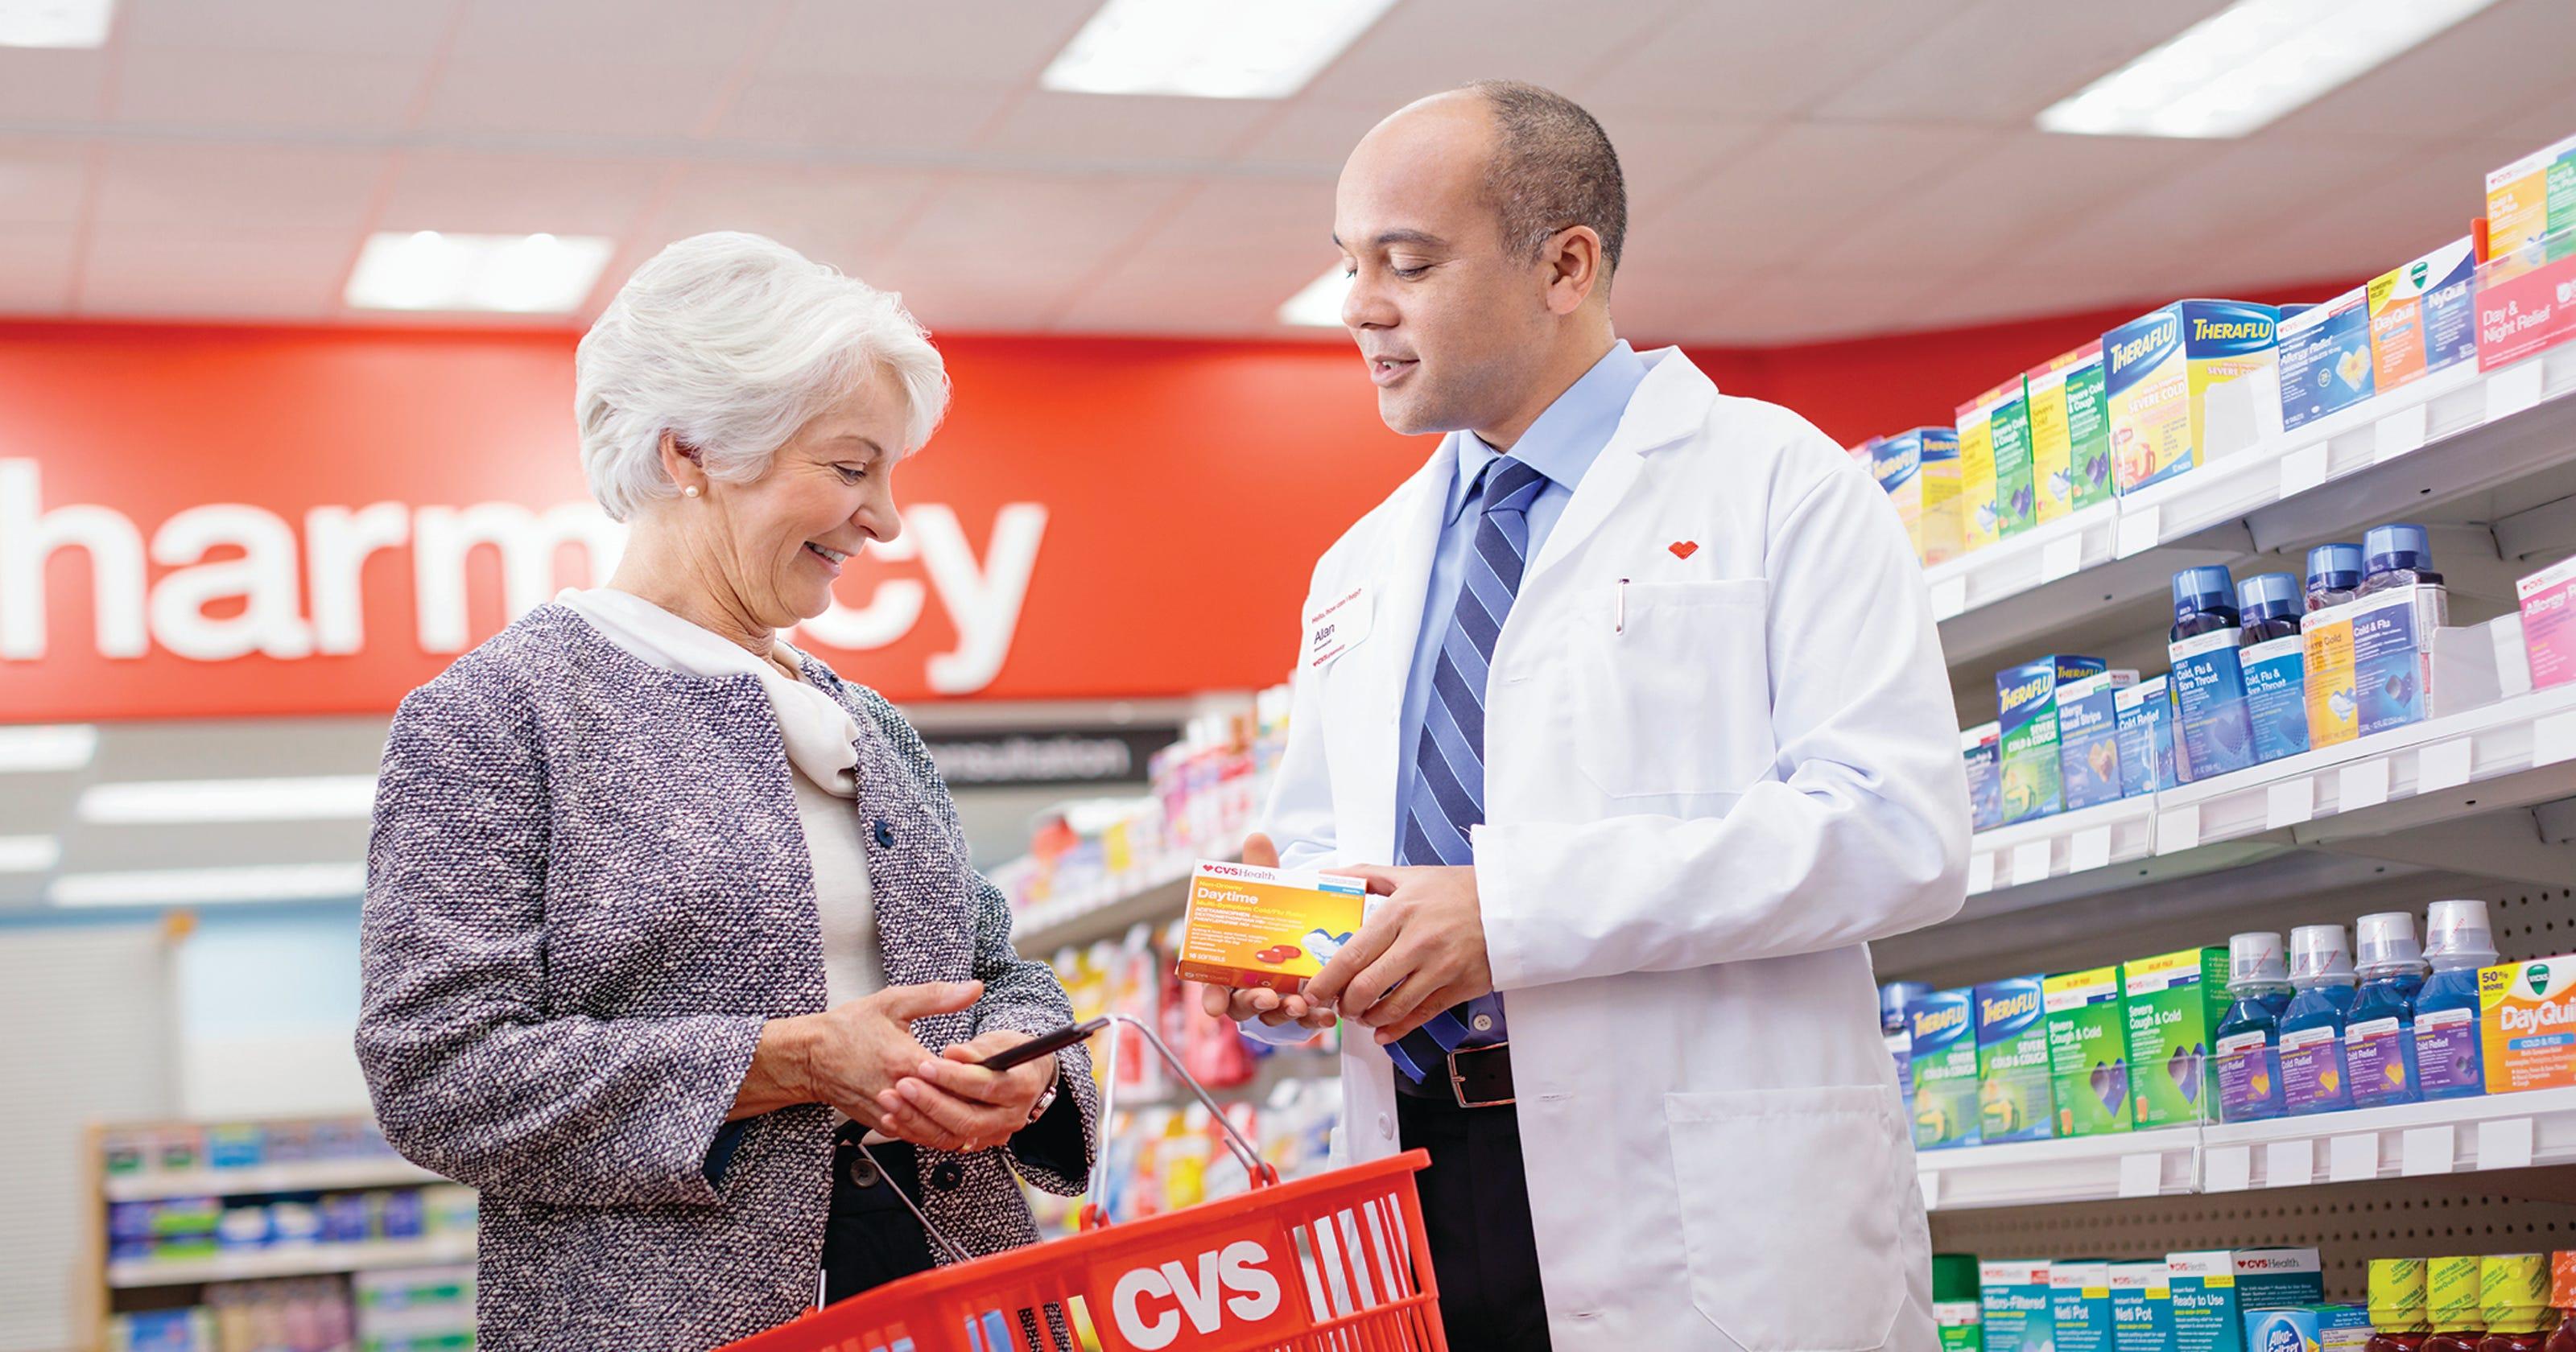 CVS Pharmacy stores get makeover after ending tobacco sales